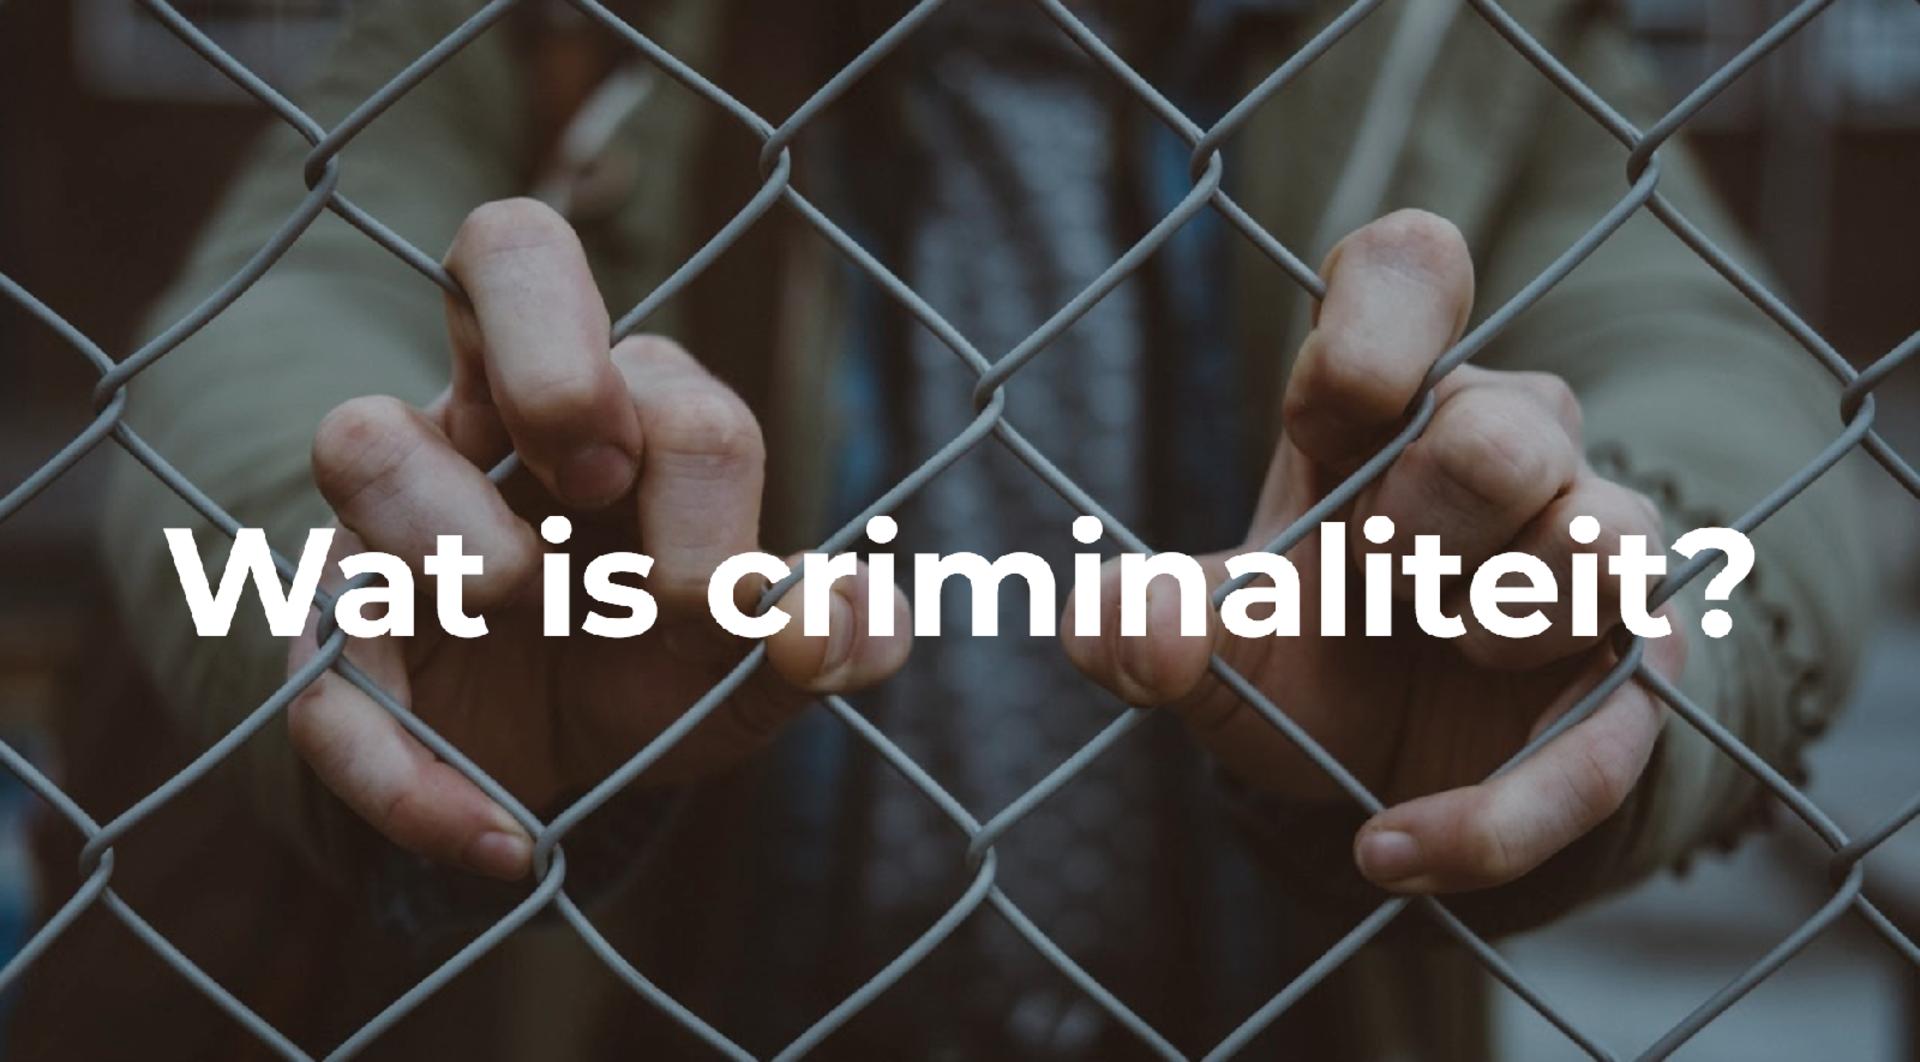 Les criminaliteit